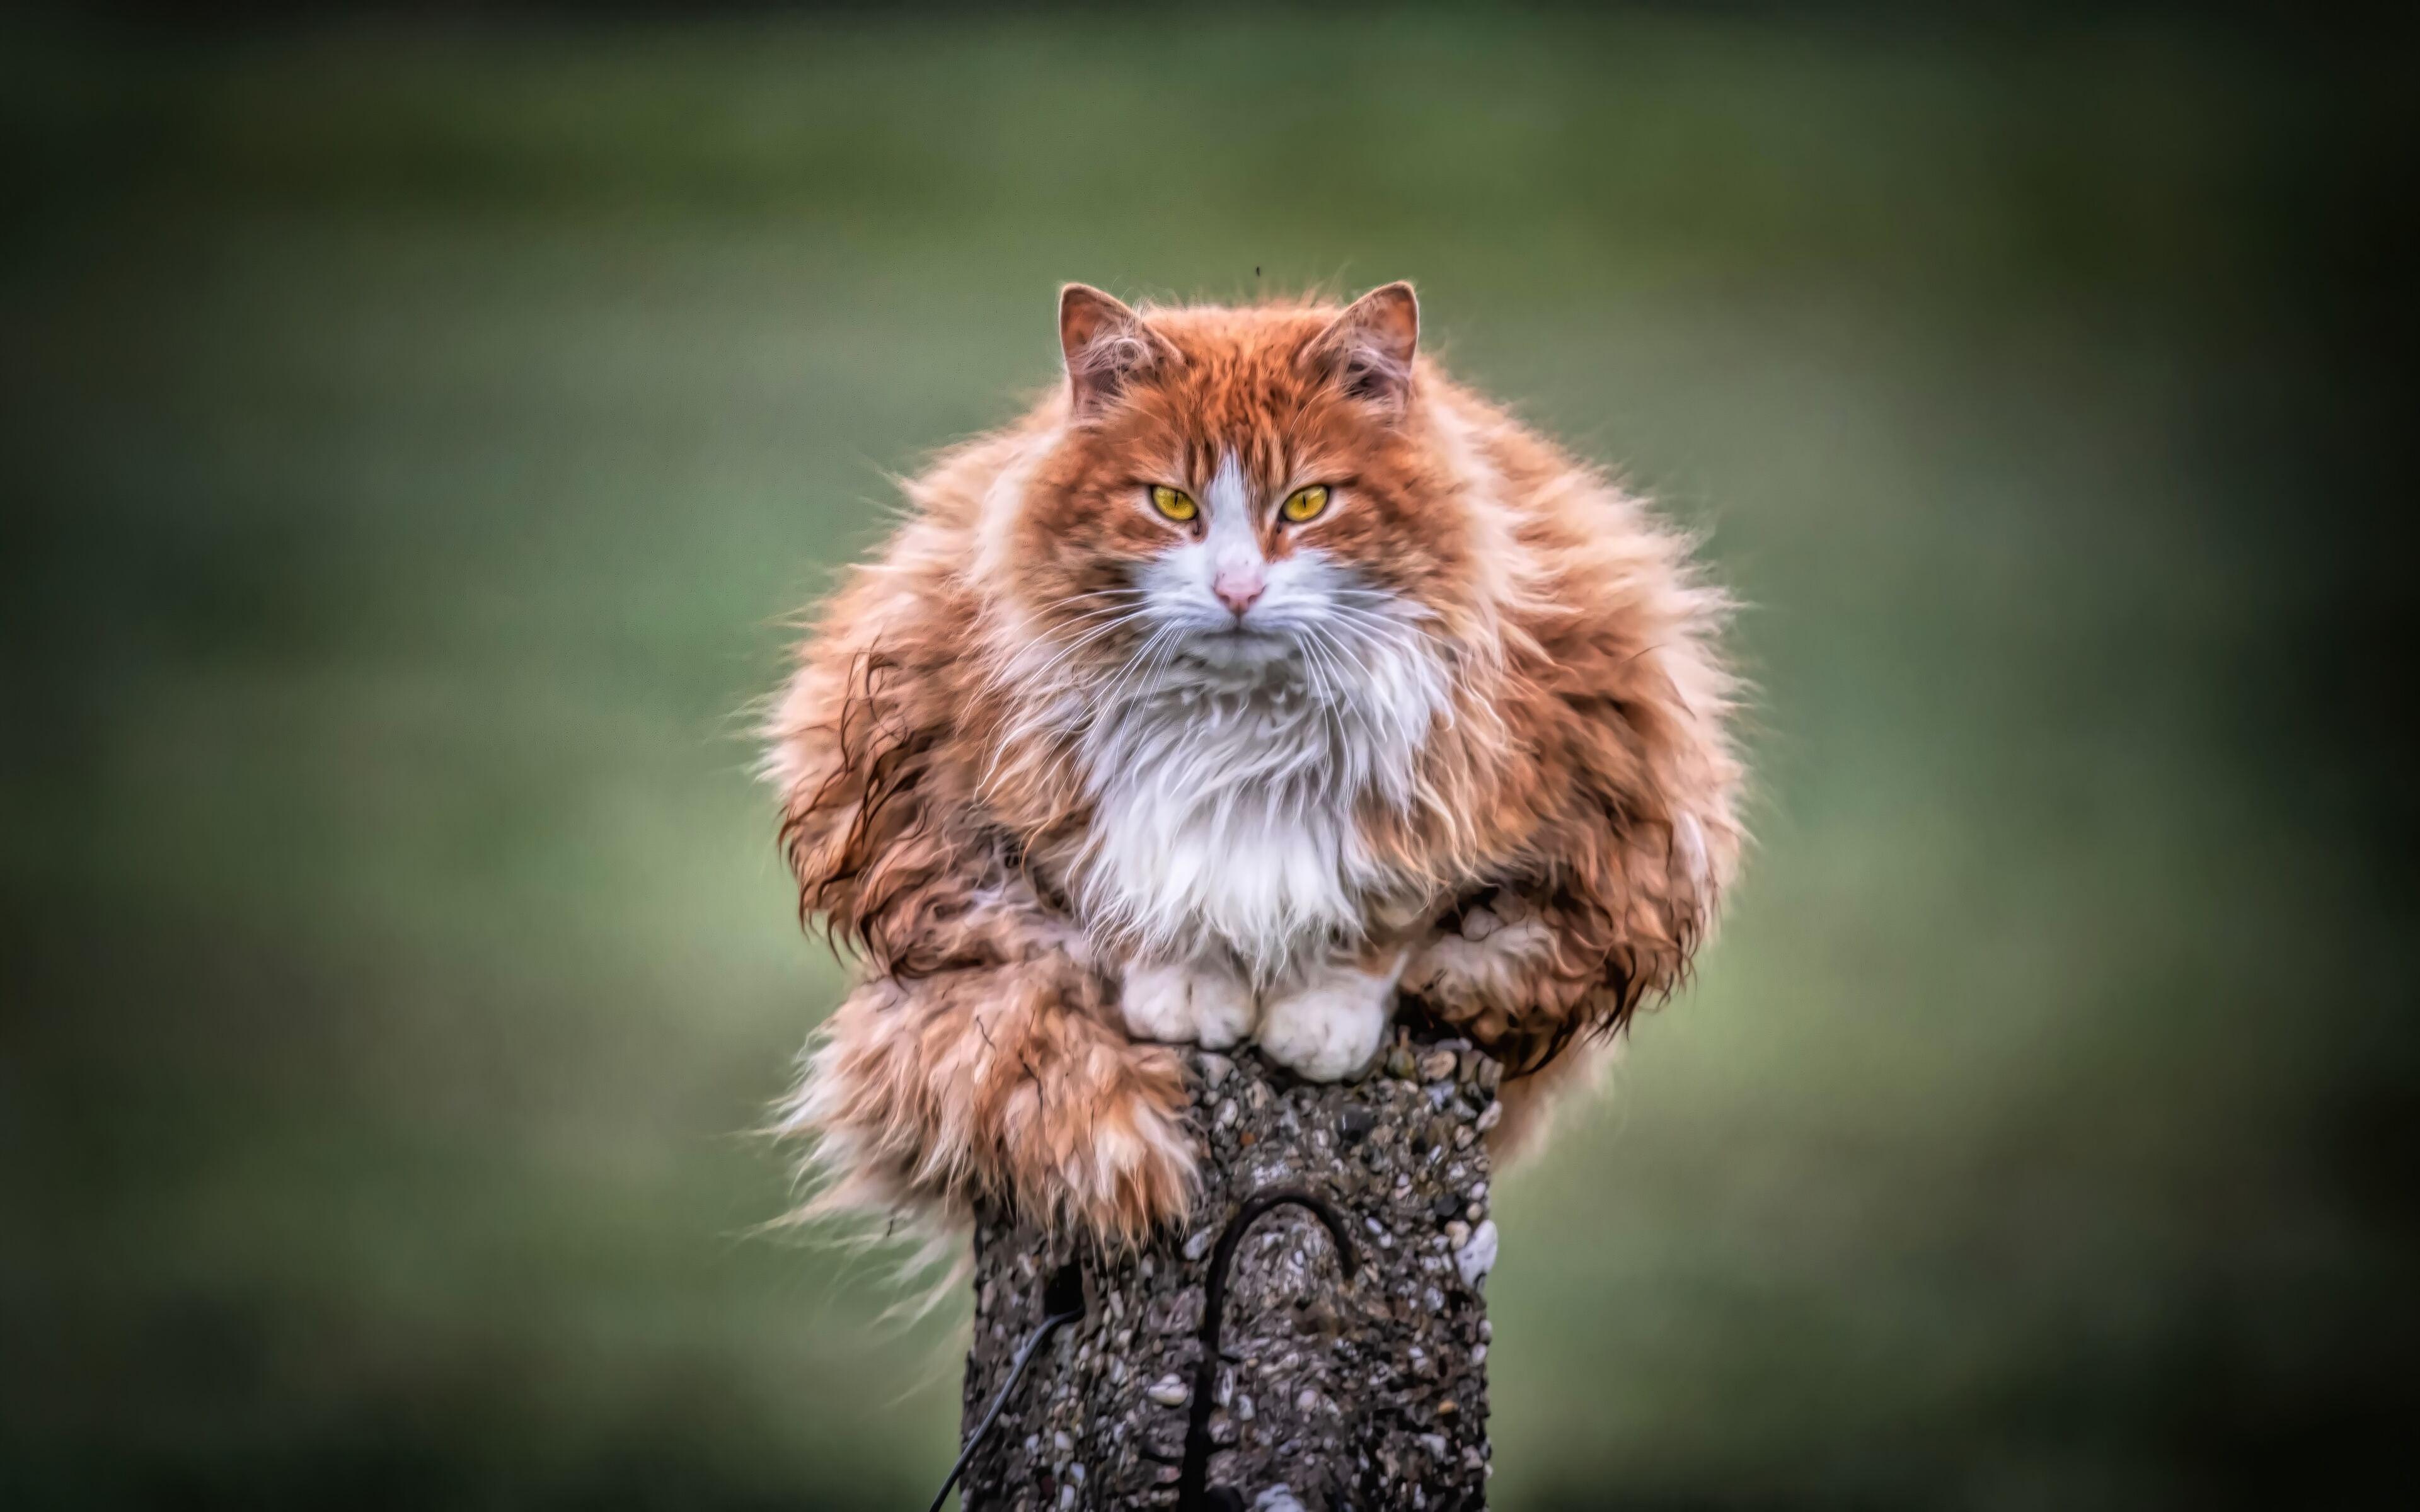 wild-cat-4k-s0.jpg